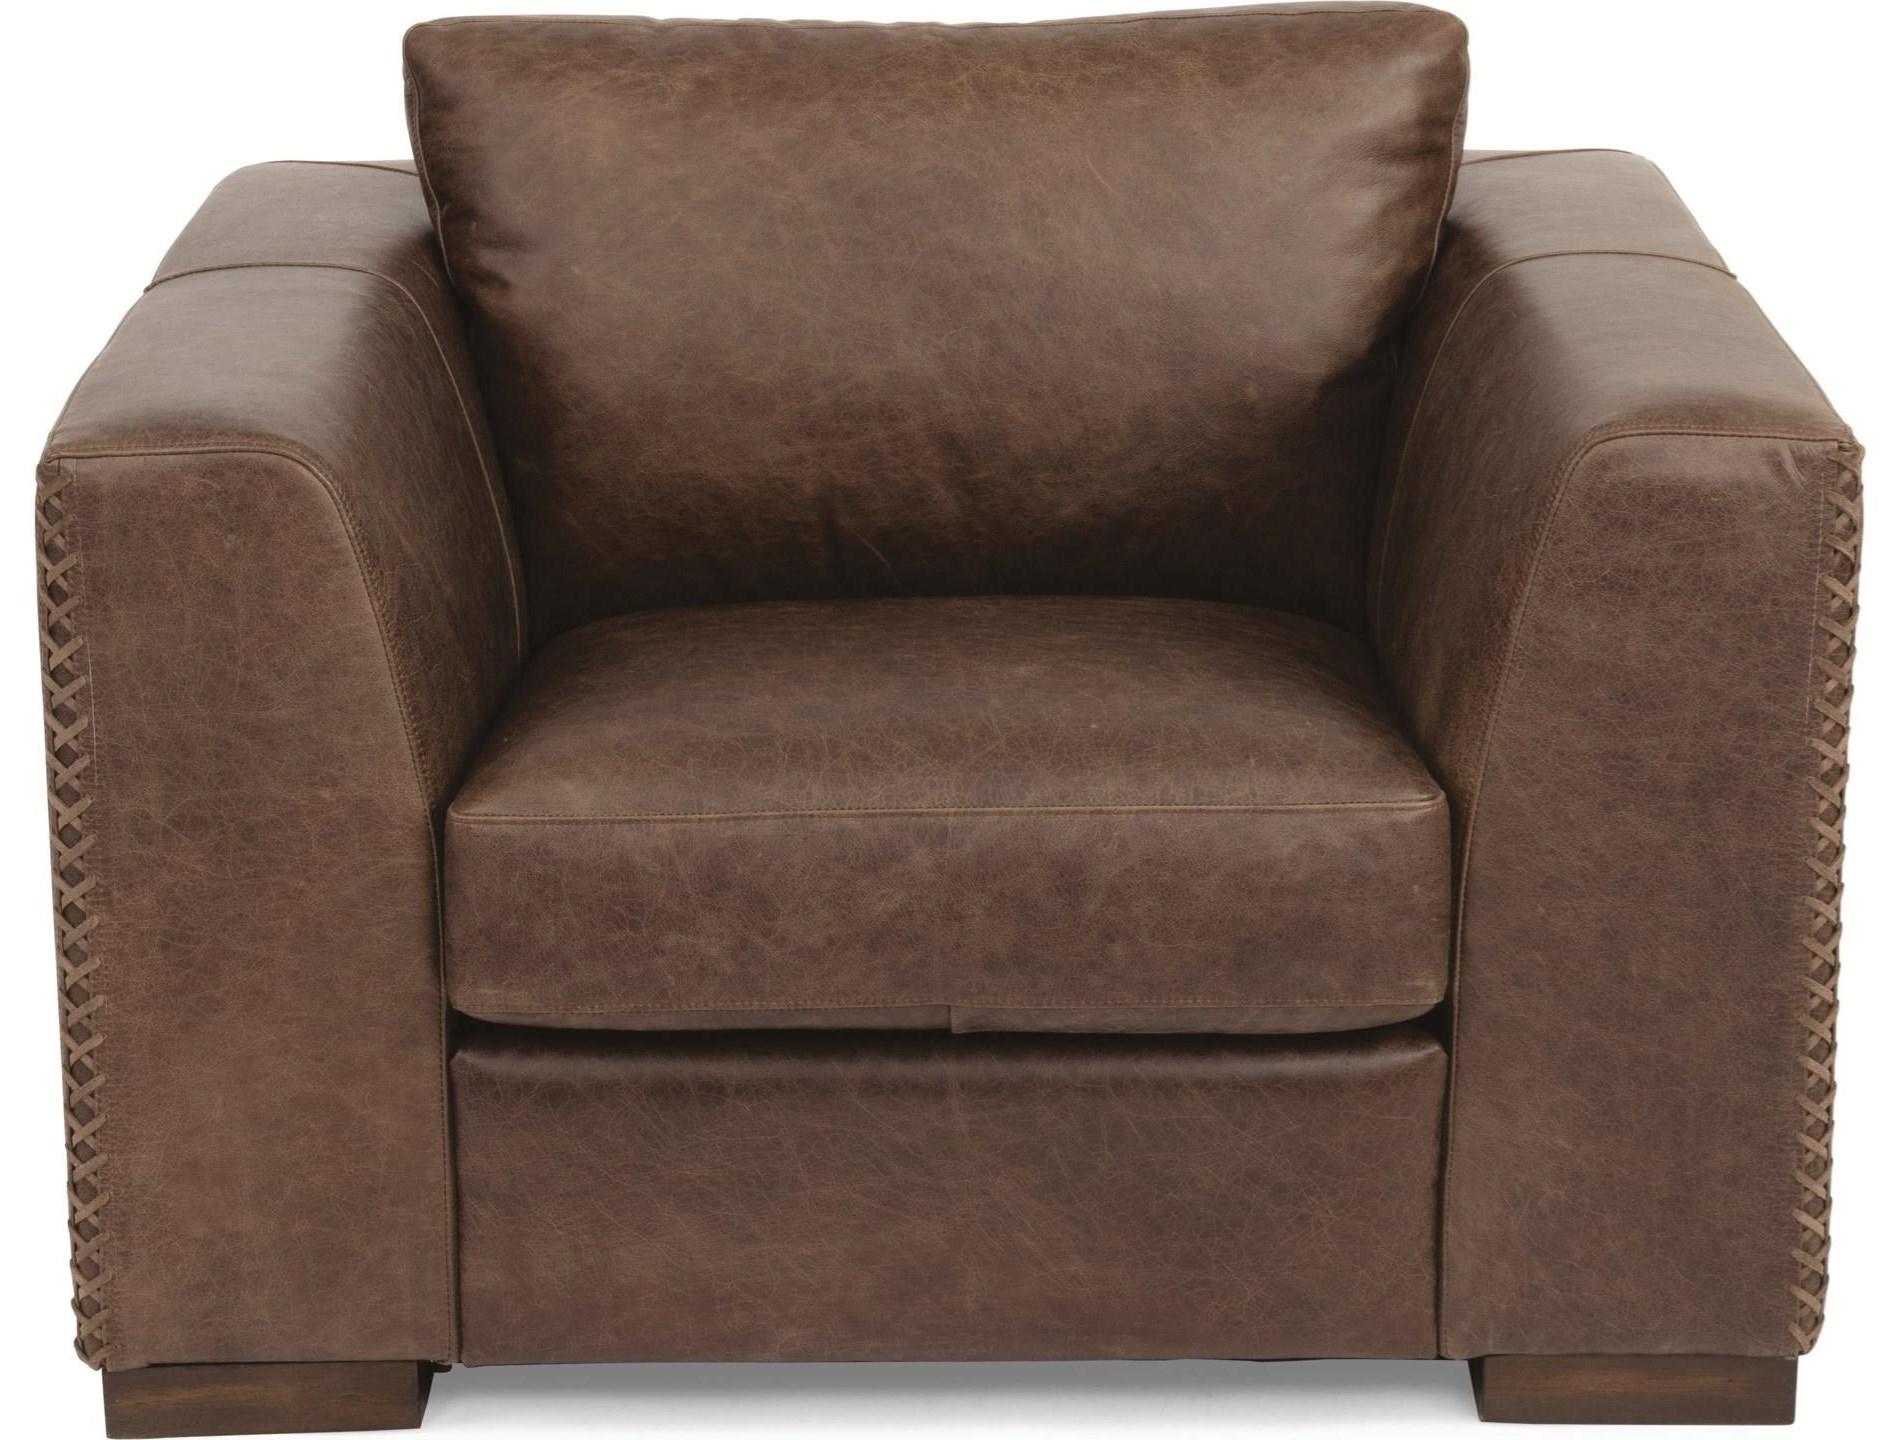 Nicolas Chair by Flexsteel at Crowley Furniture & Mattress